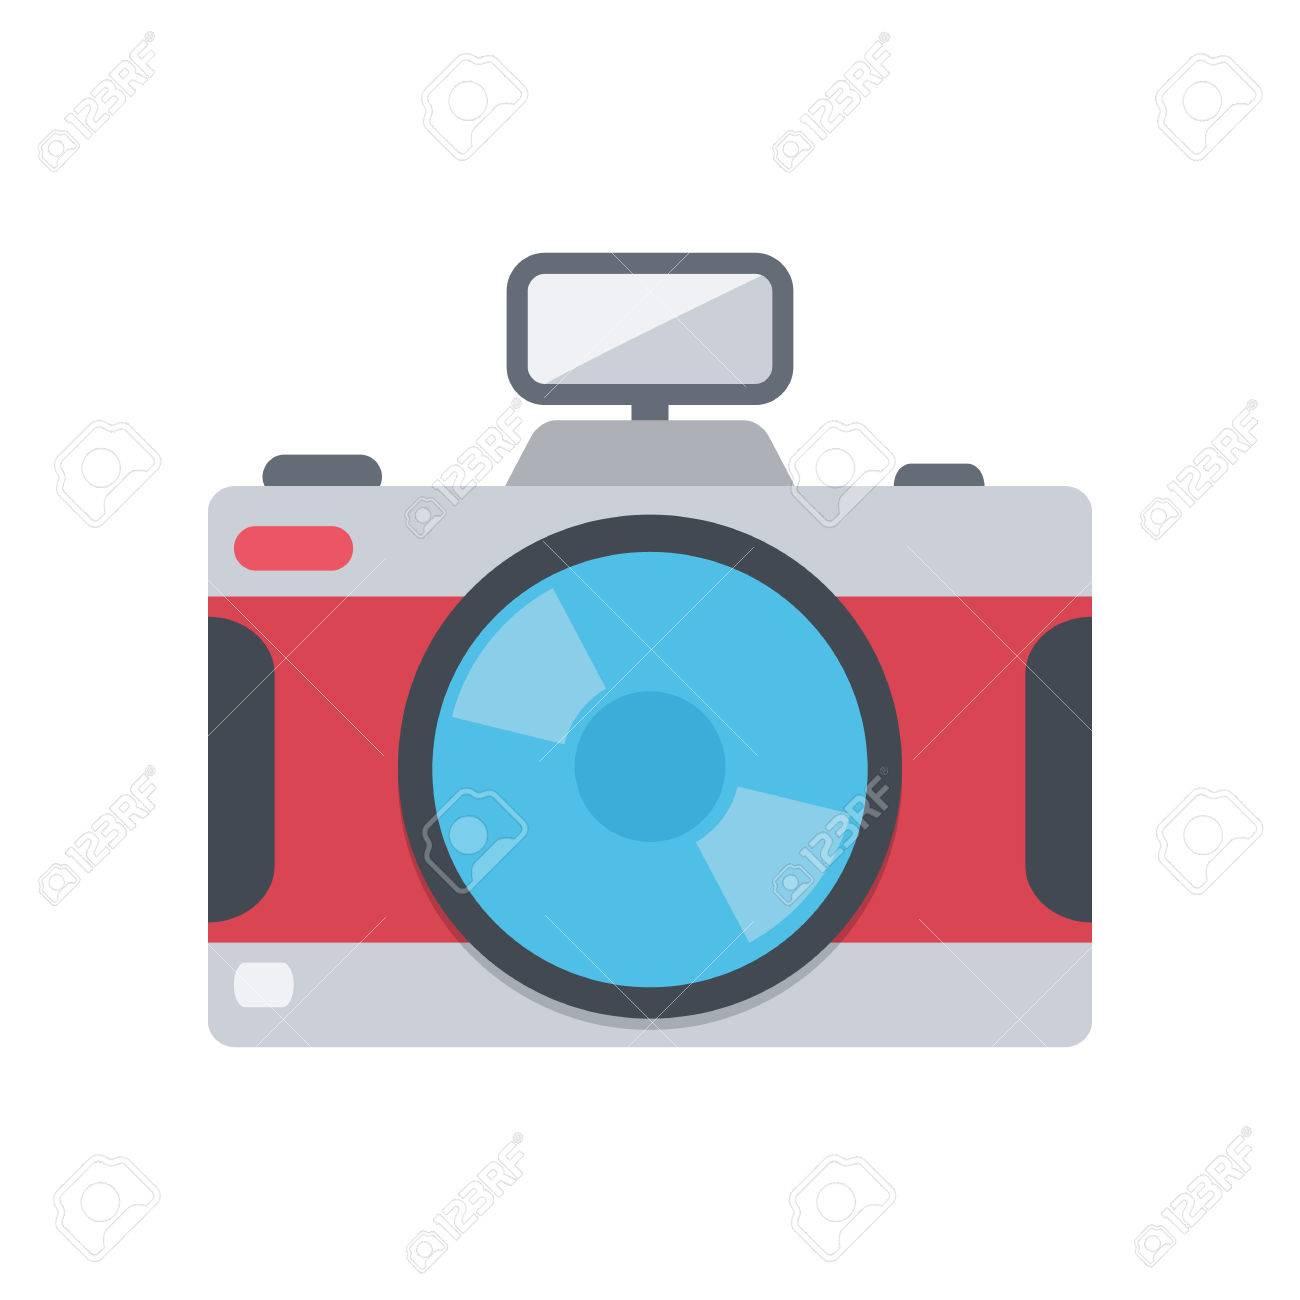 Camera. Stock Vector - 37673545